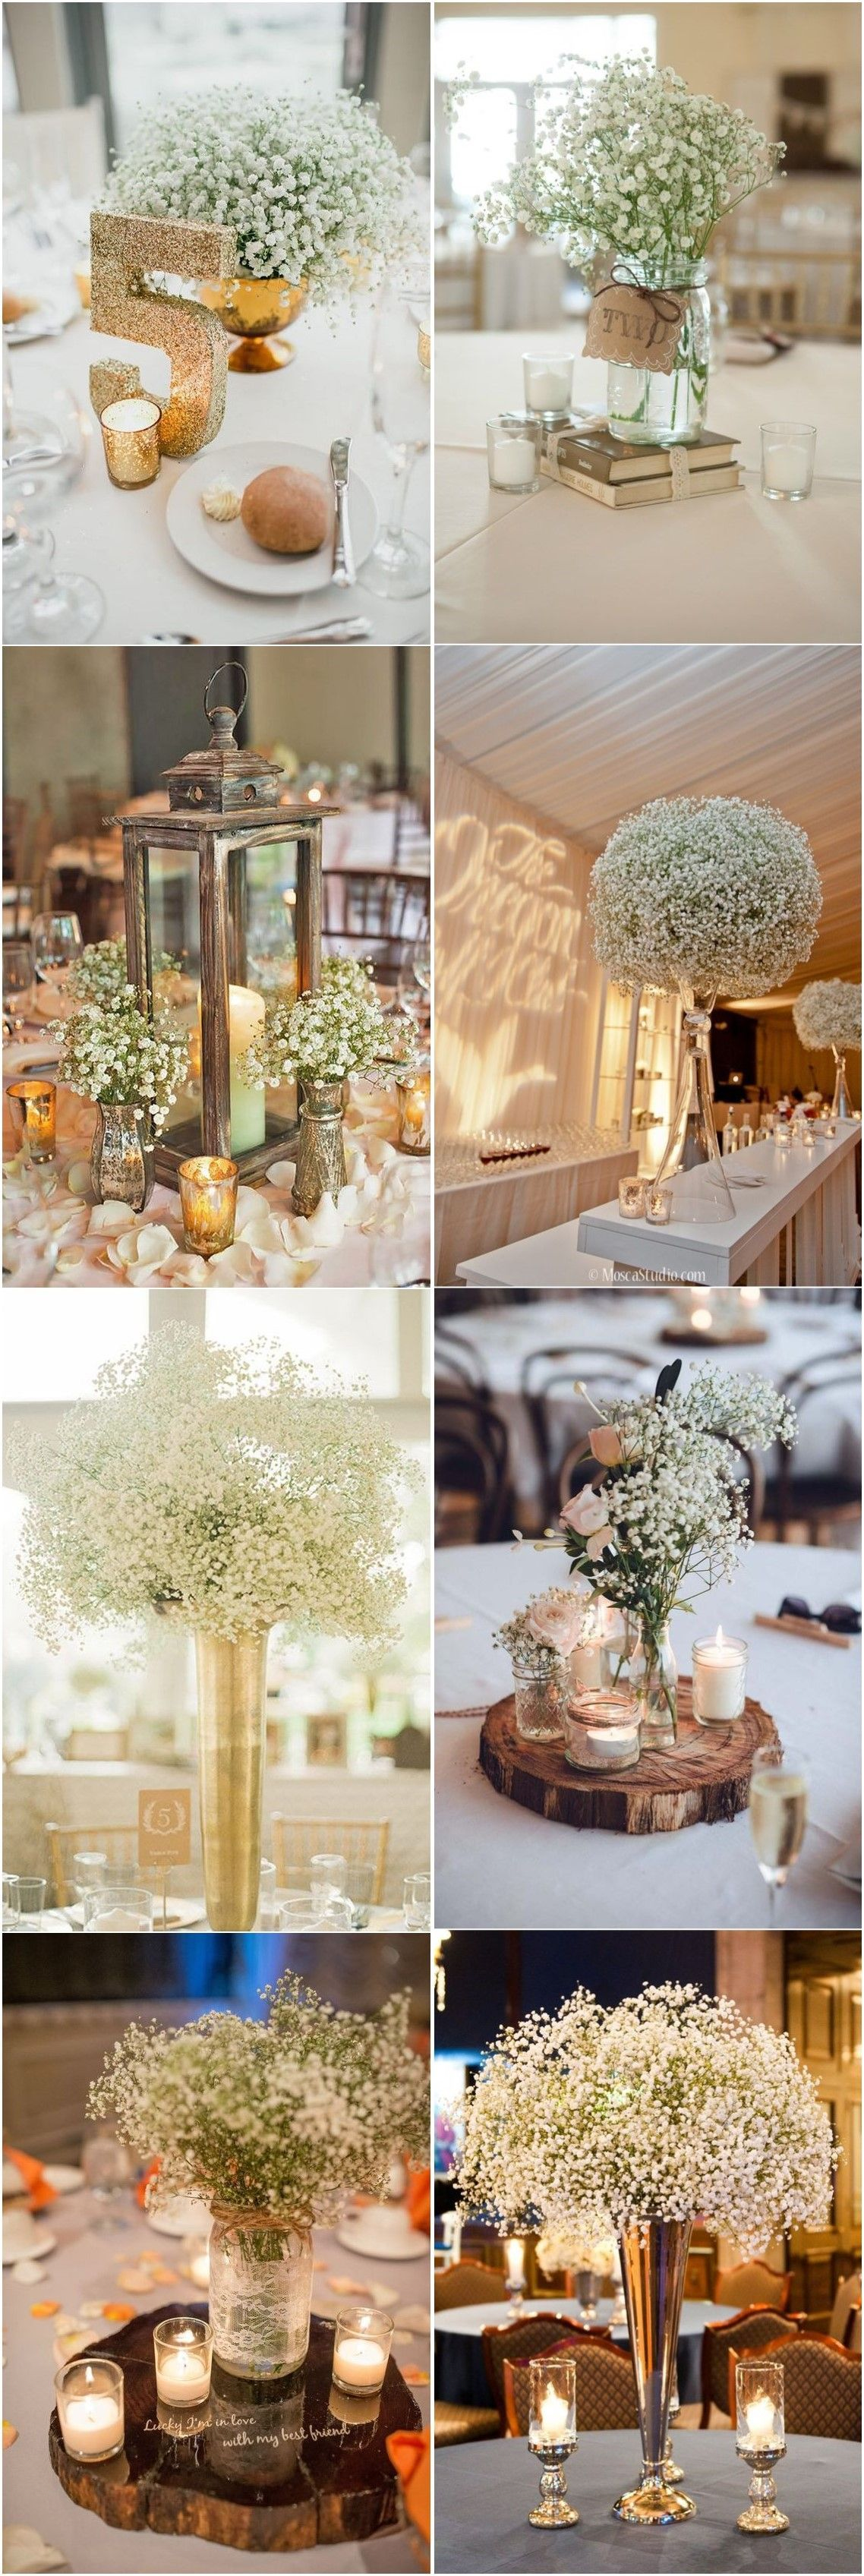 Wedding decoration ideas rustic   Rustic Babyus Breath Wedding Centerpiece Decorations Ideas